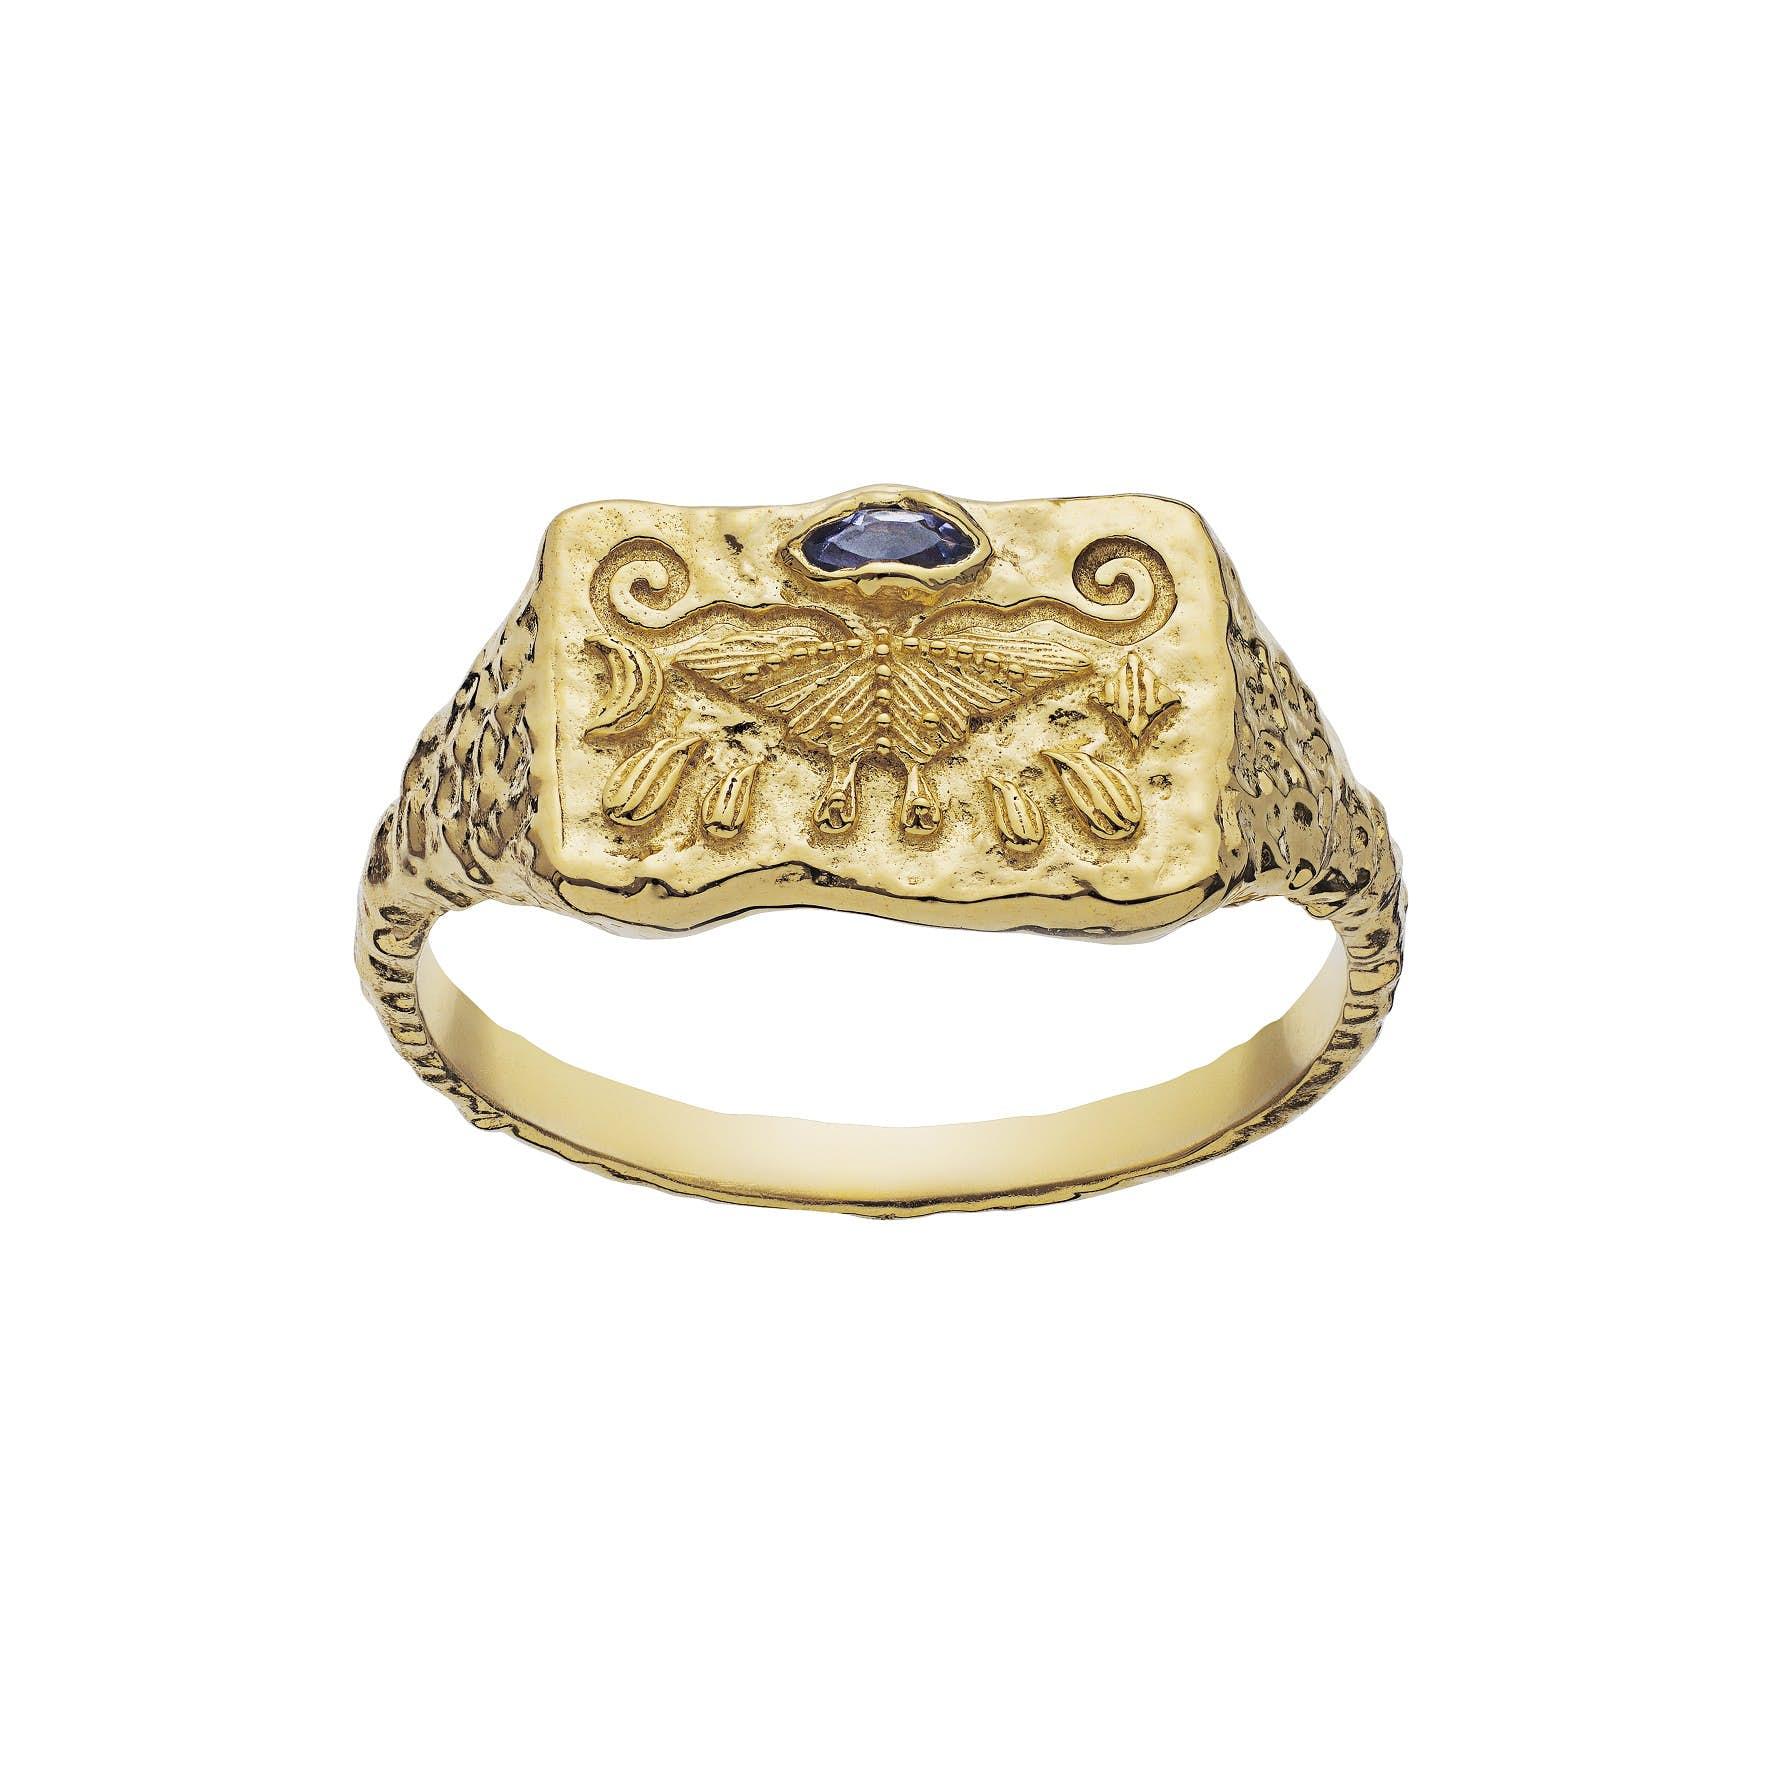 Gry Ring von Maanesten in Vergoldet-Silber Sterling 925